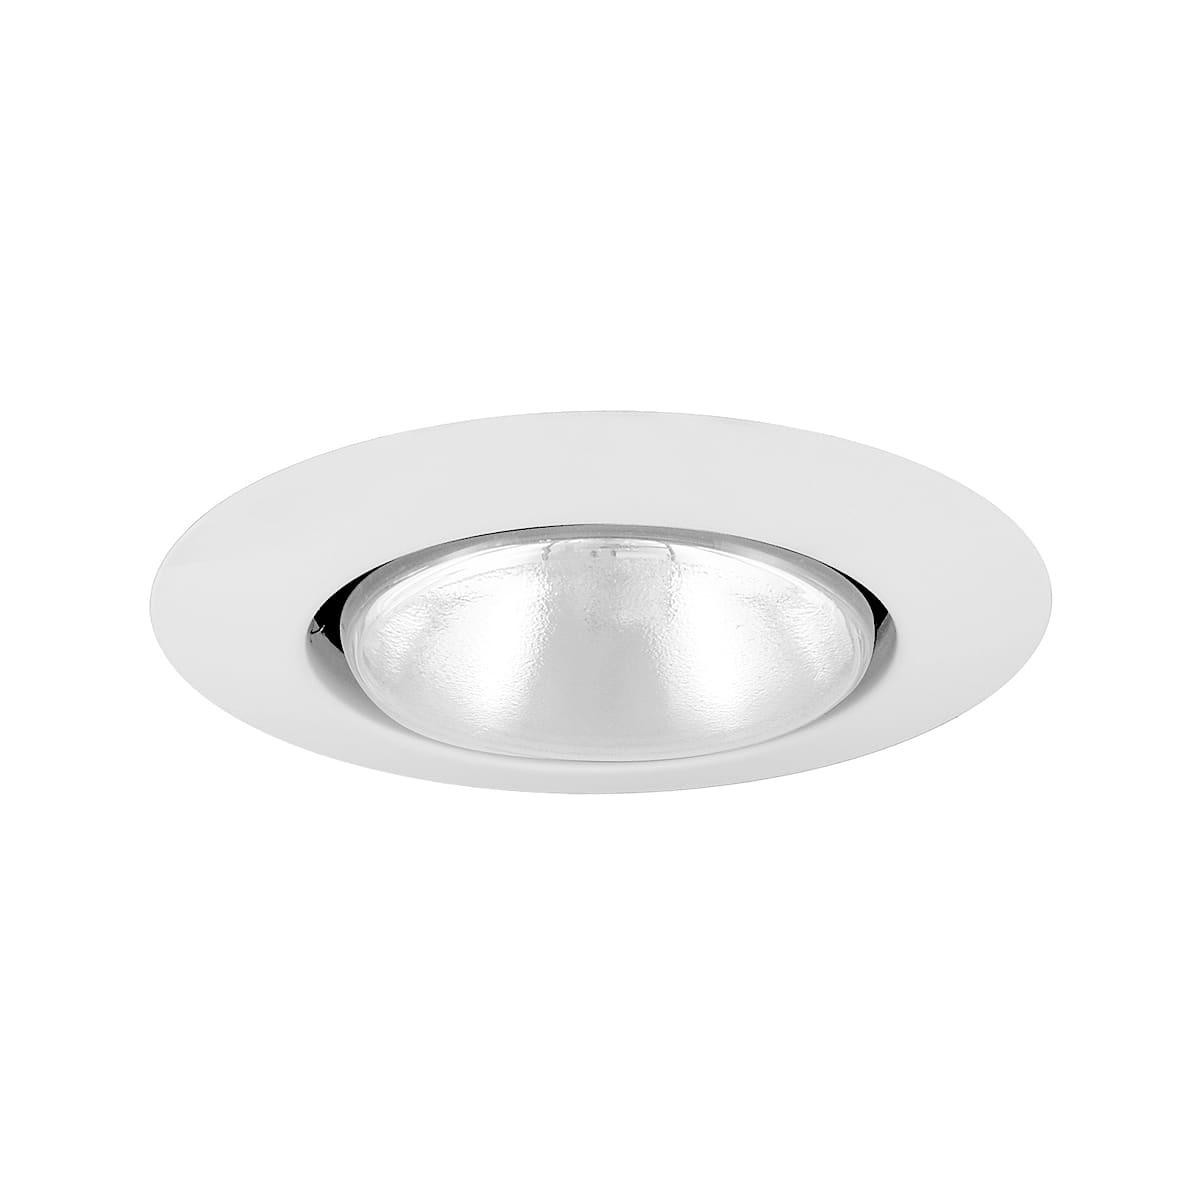 Jesco Lighting Tm601